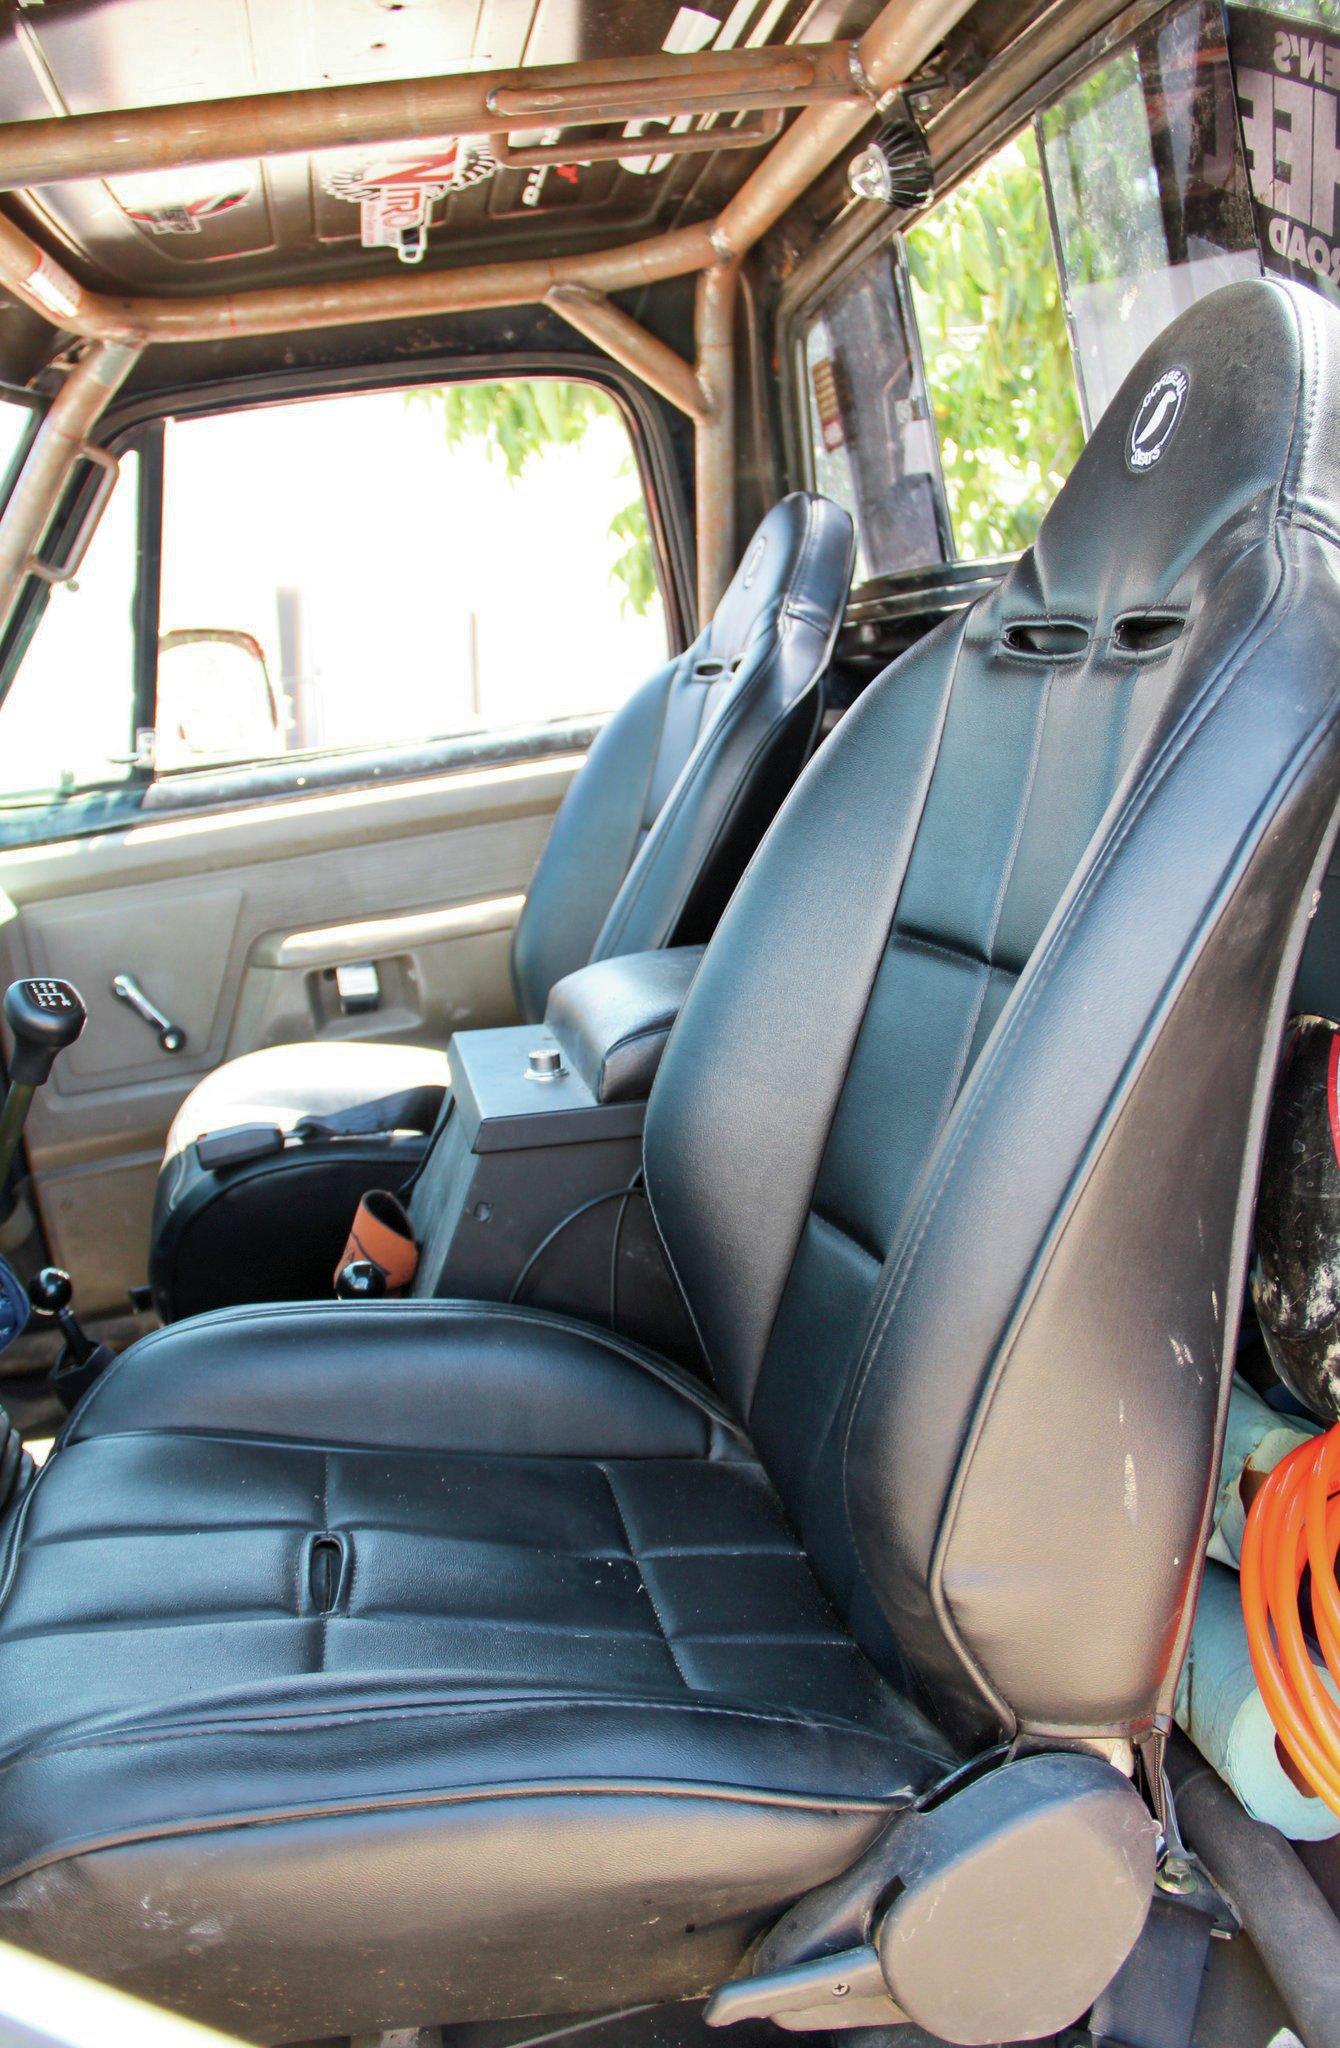 corbeau seats installed